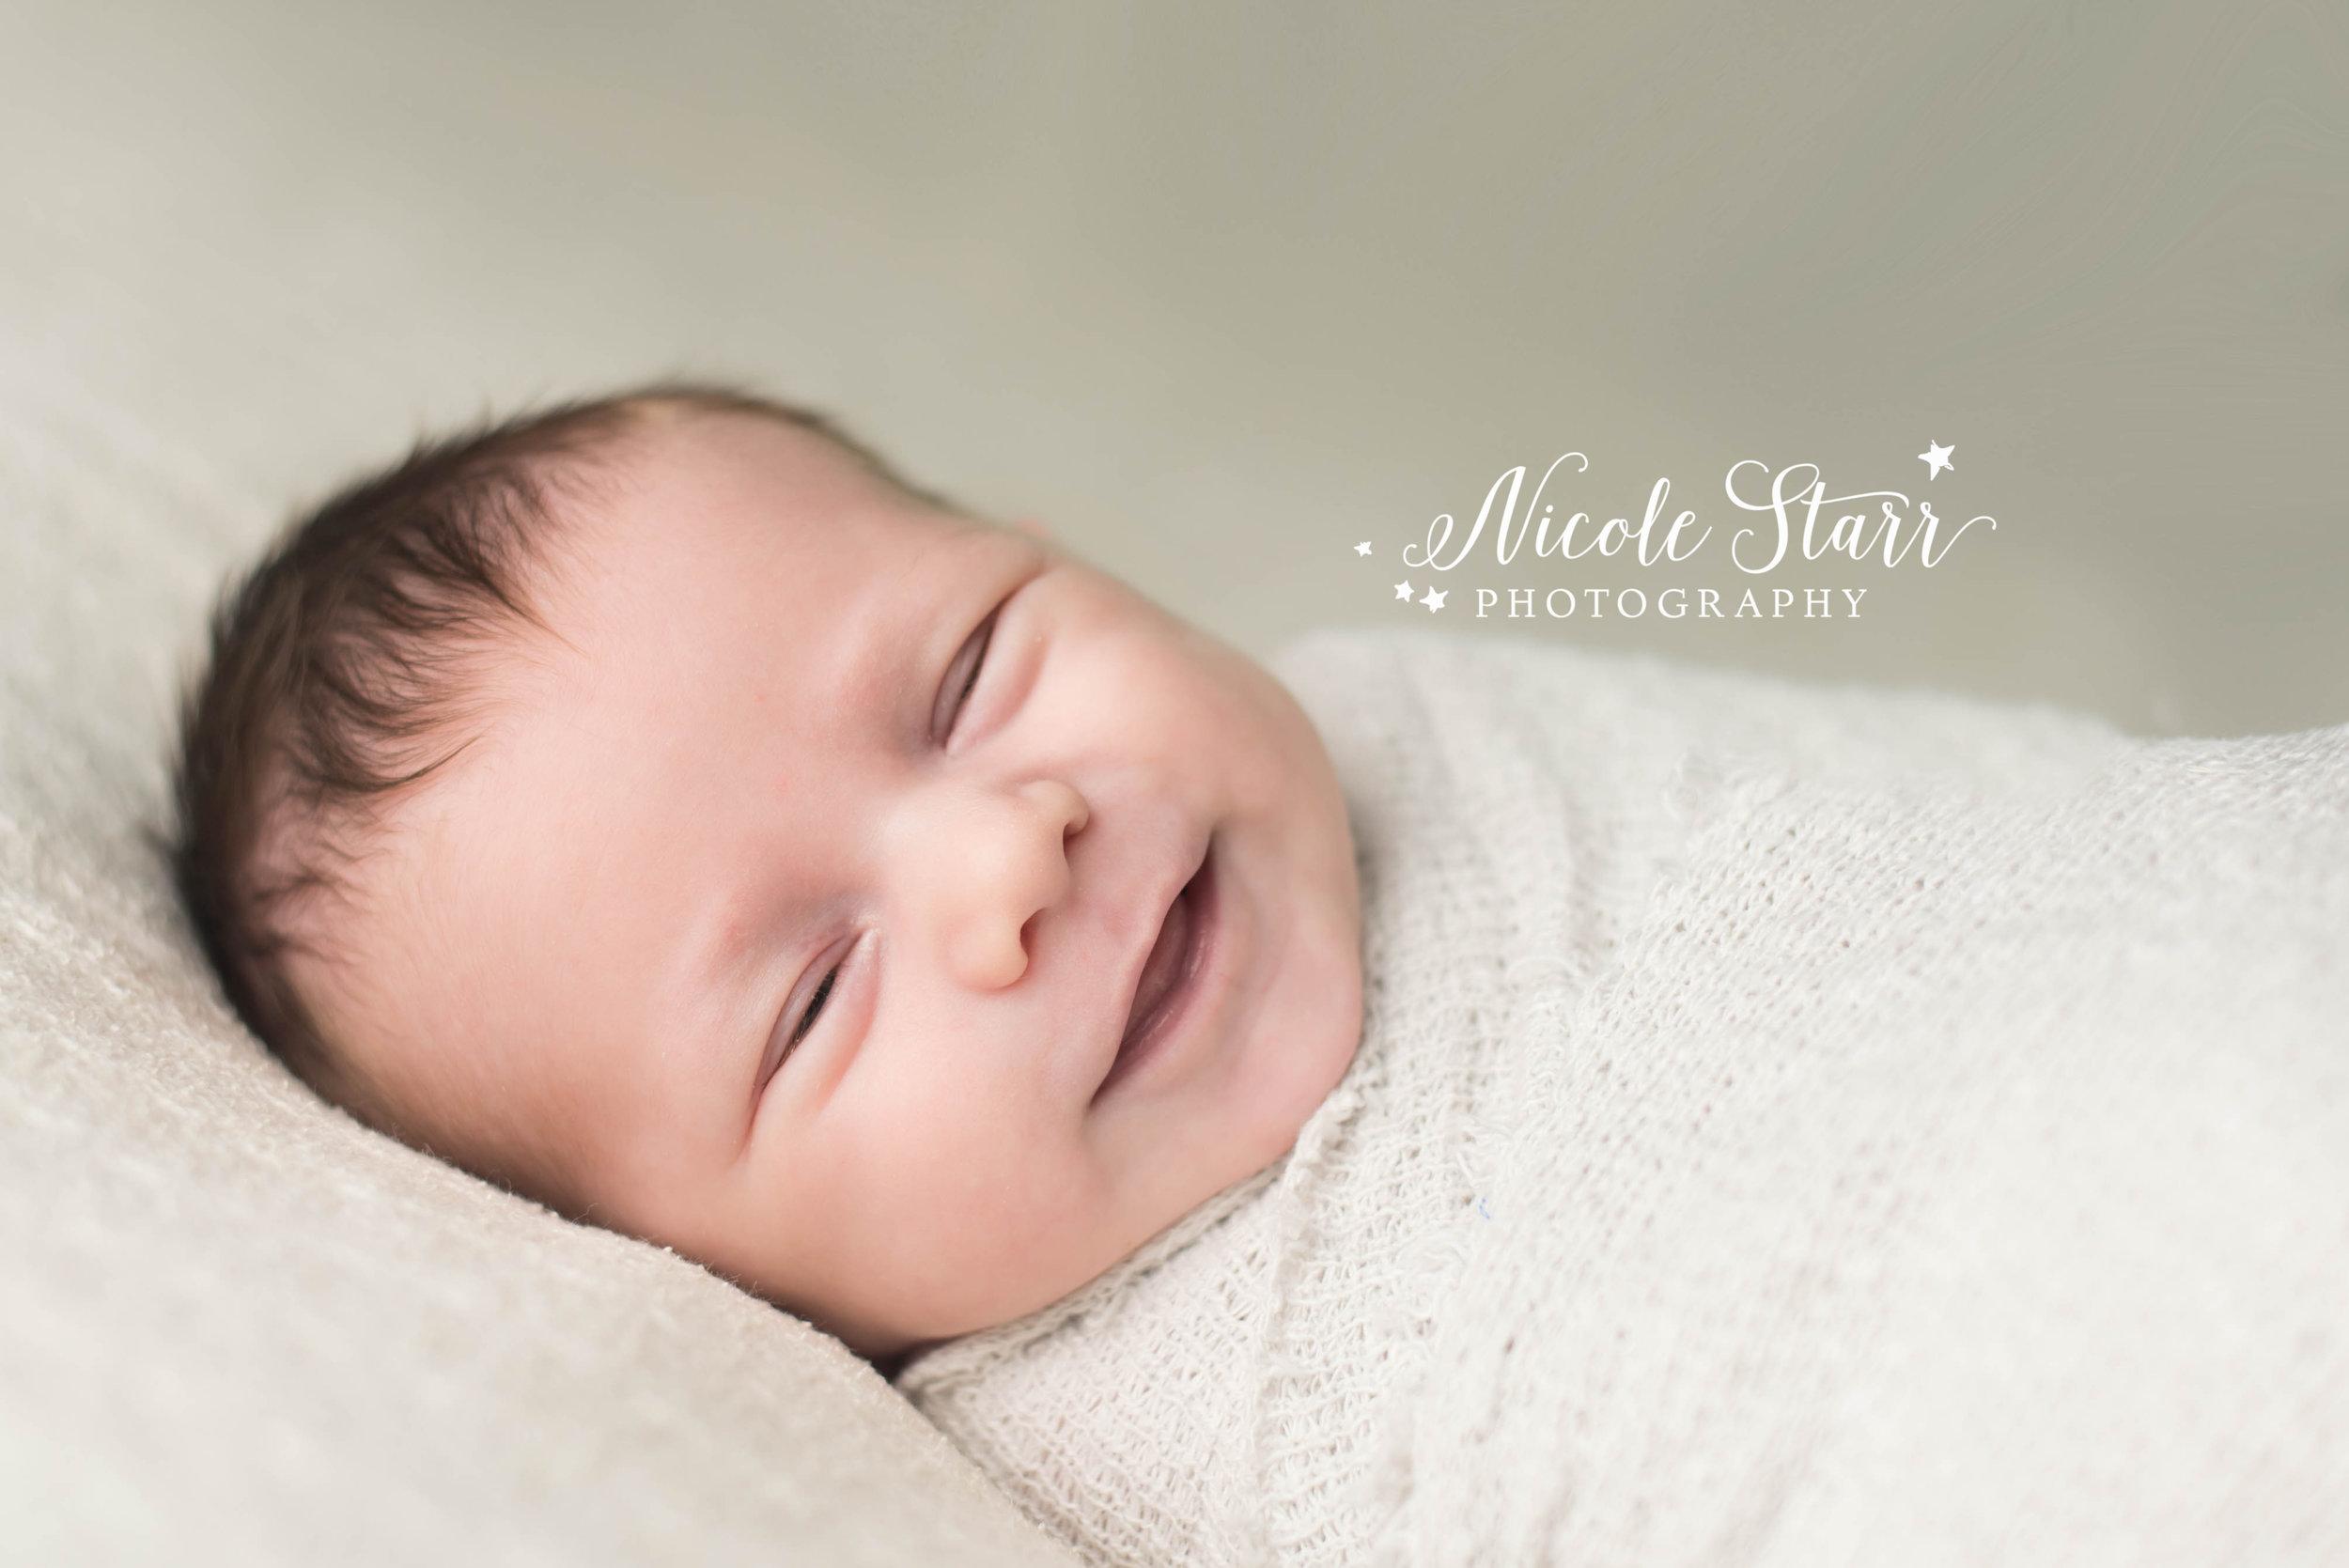 WM nicole starr photography-28.jpg